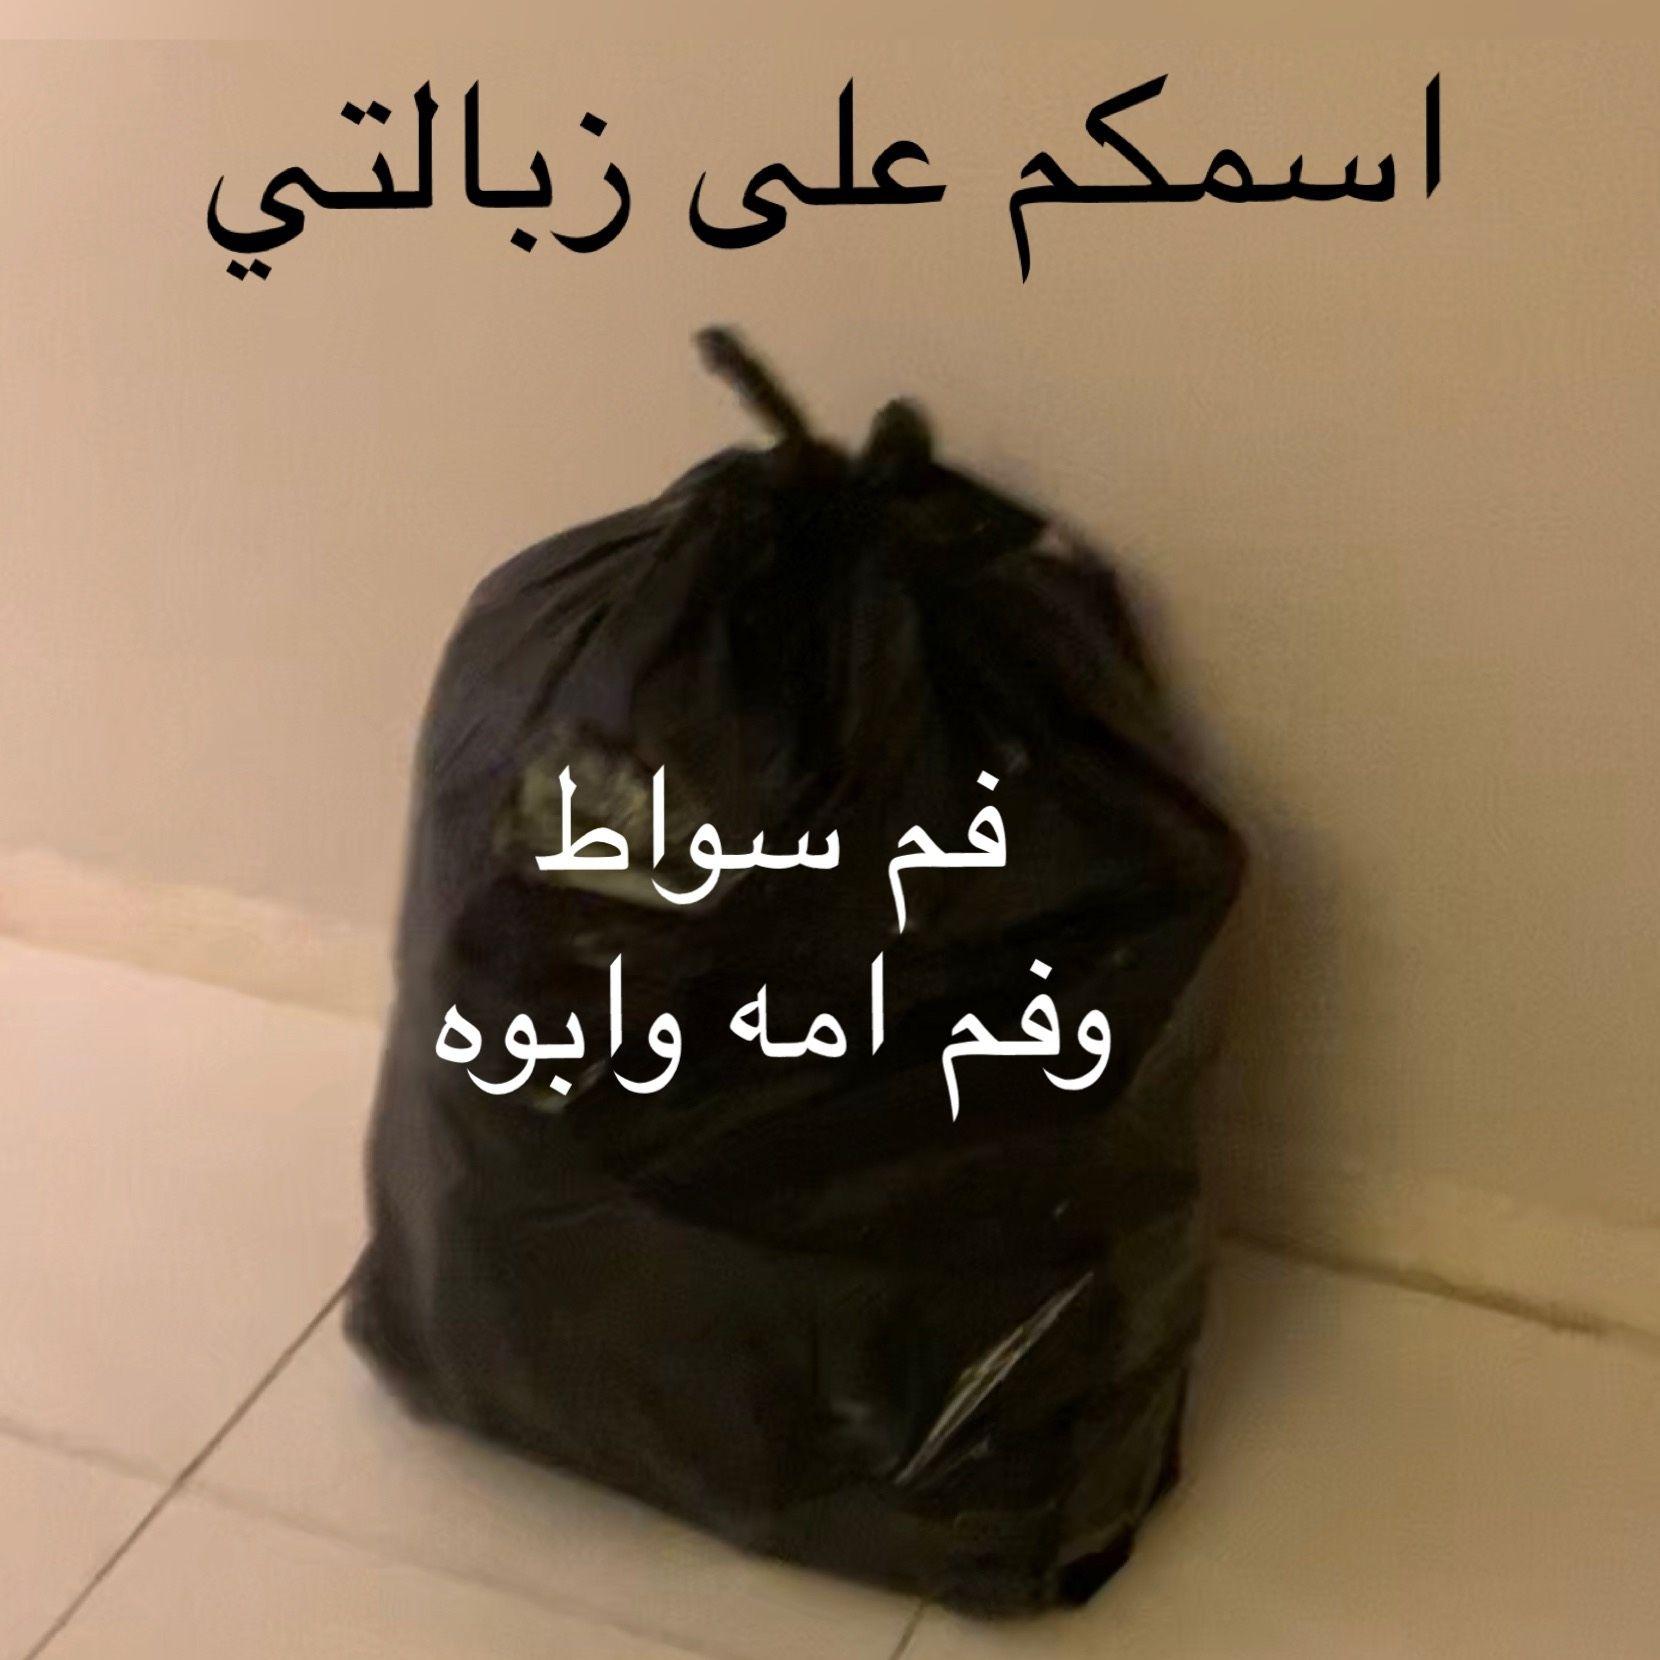 Pin By ليلى On ابراهيم اباحيه With Images Laundry Bag Laundry